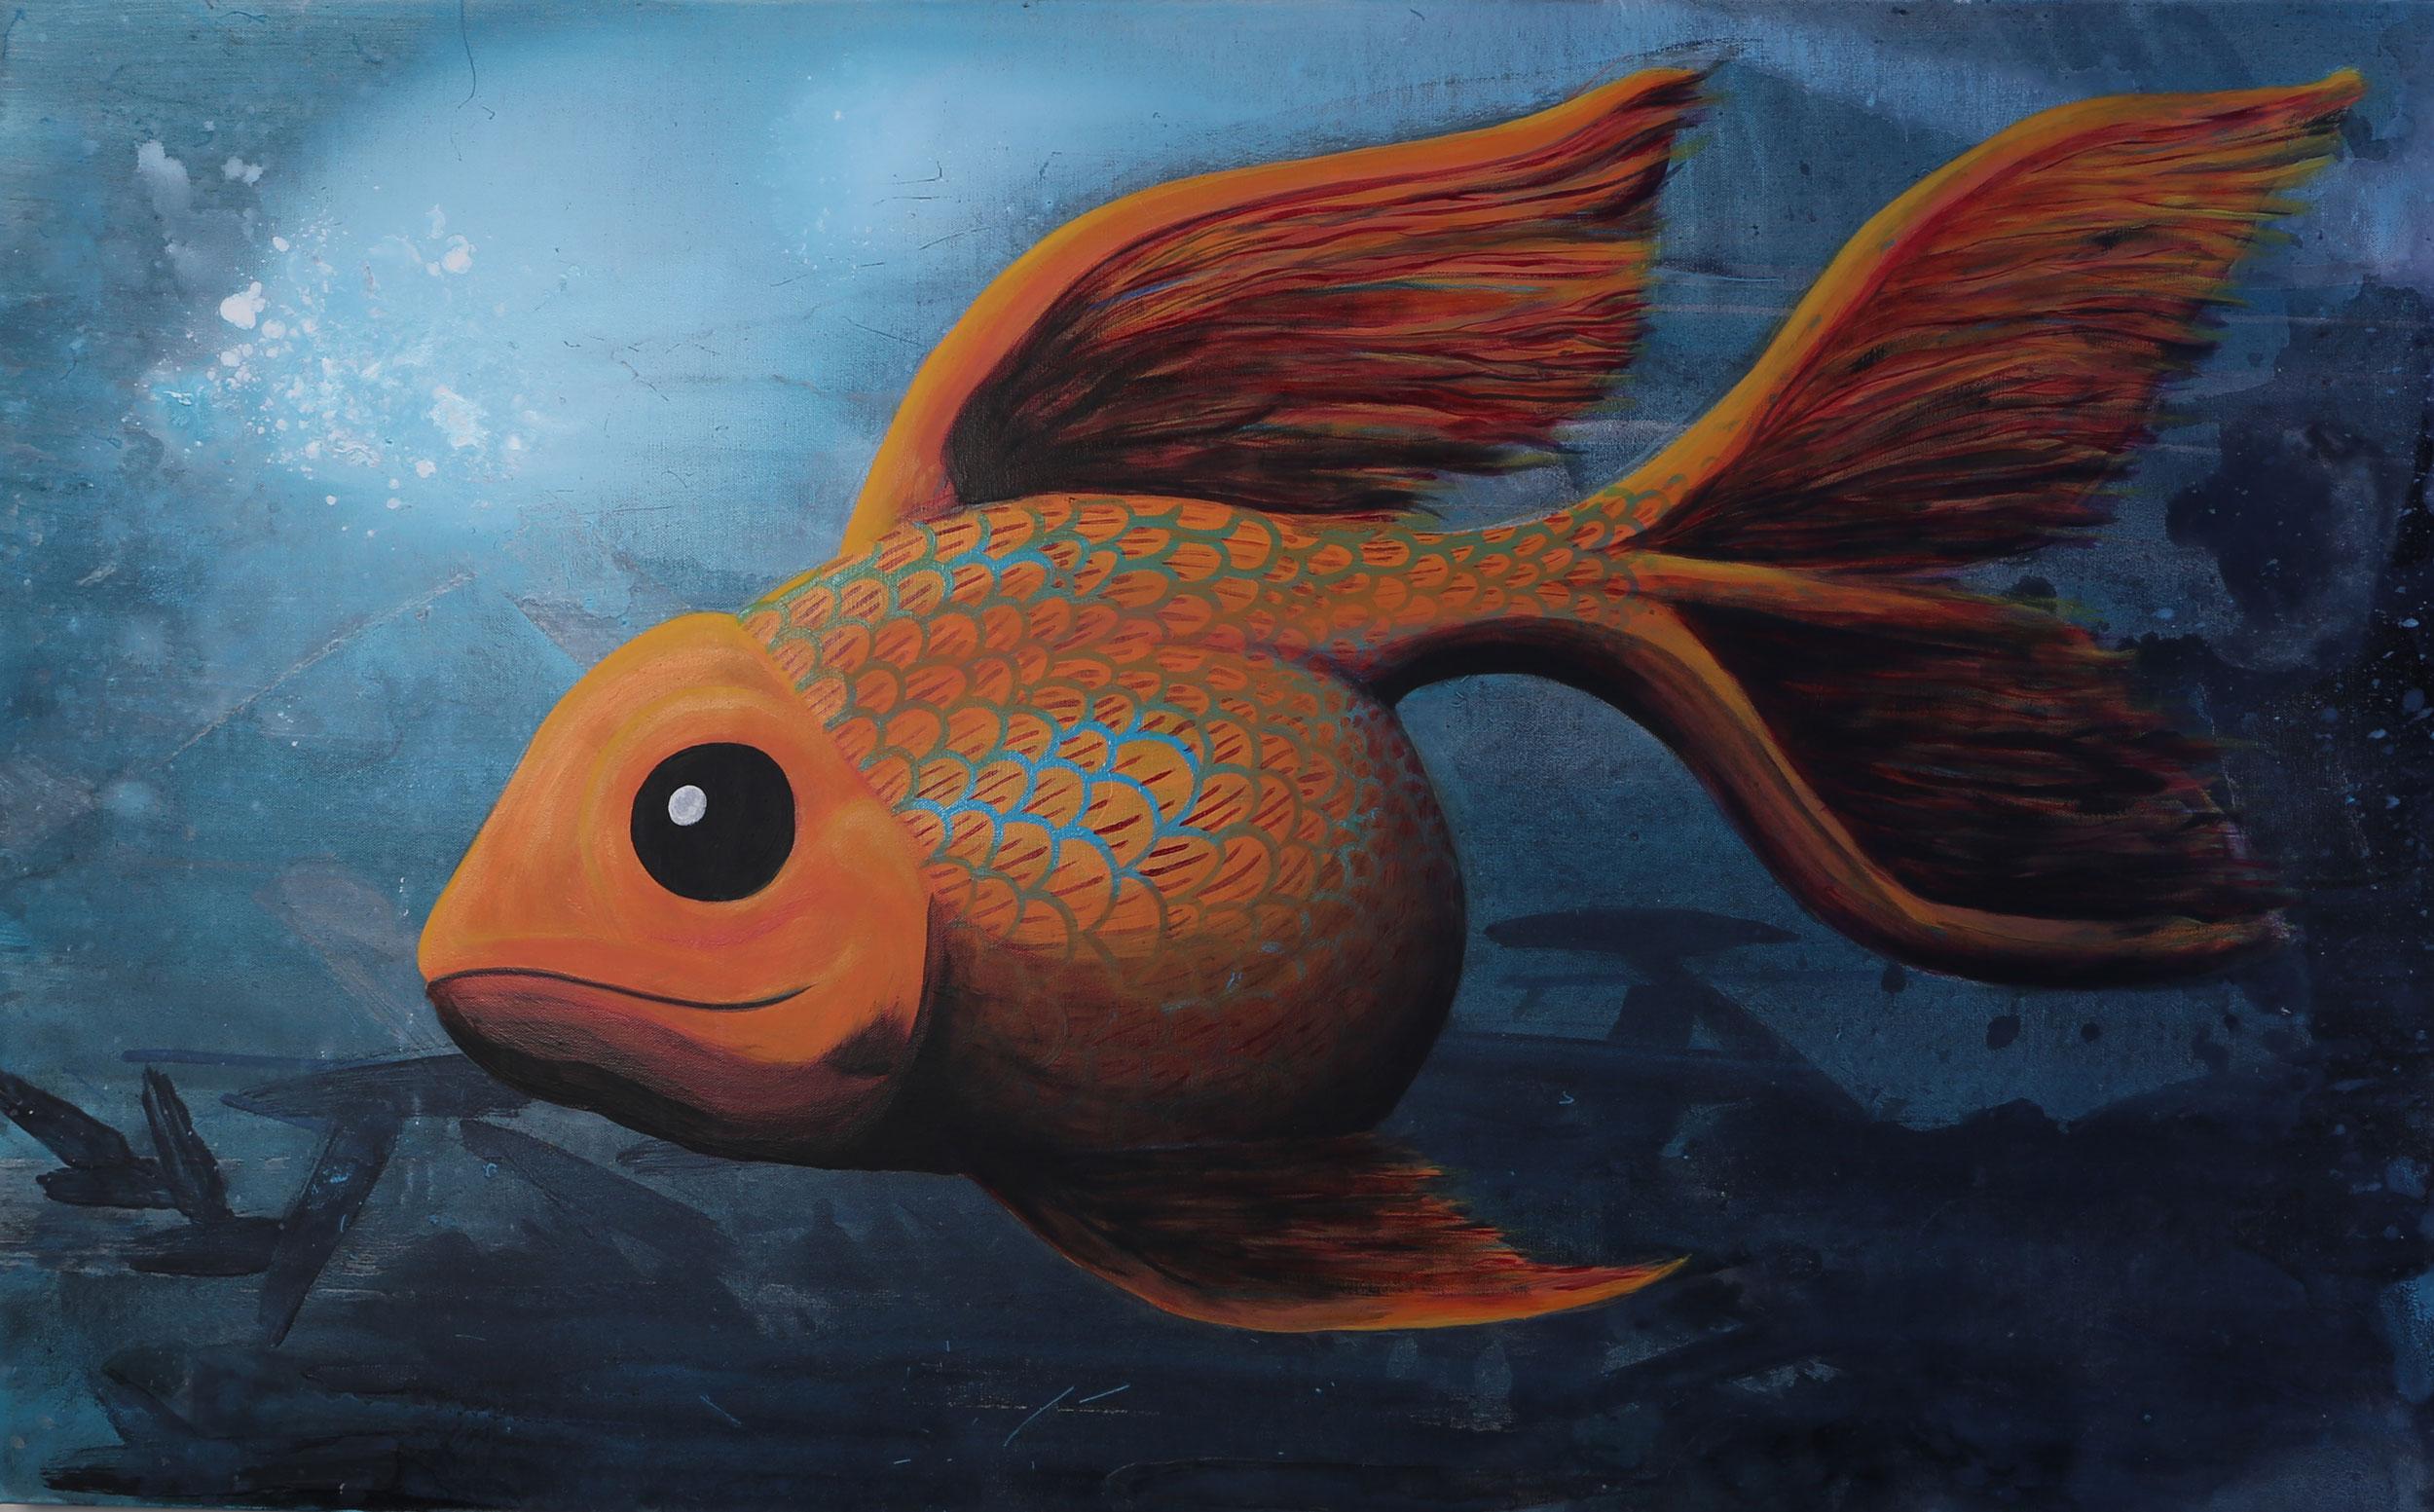 Casper-web-gonza-fish-gold-fish-art-painting-julio---gonzalez-2017.jpg